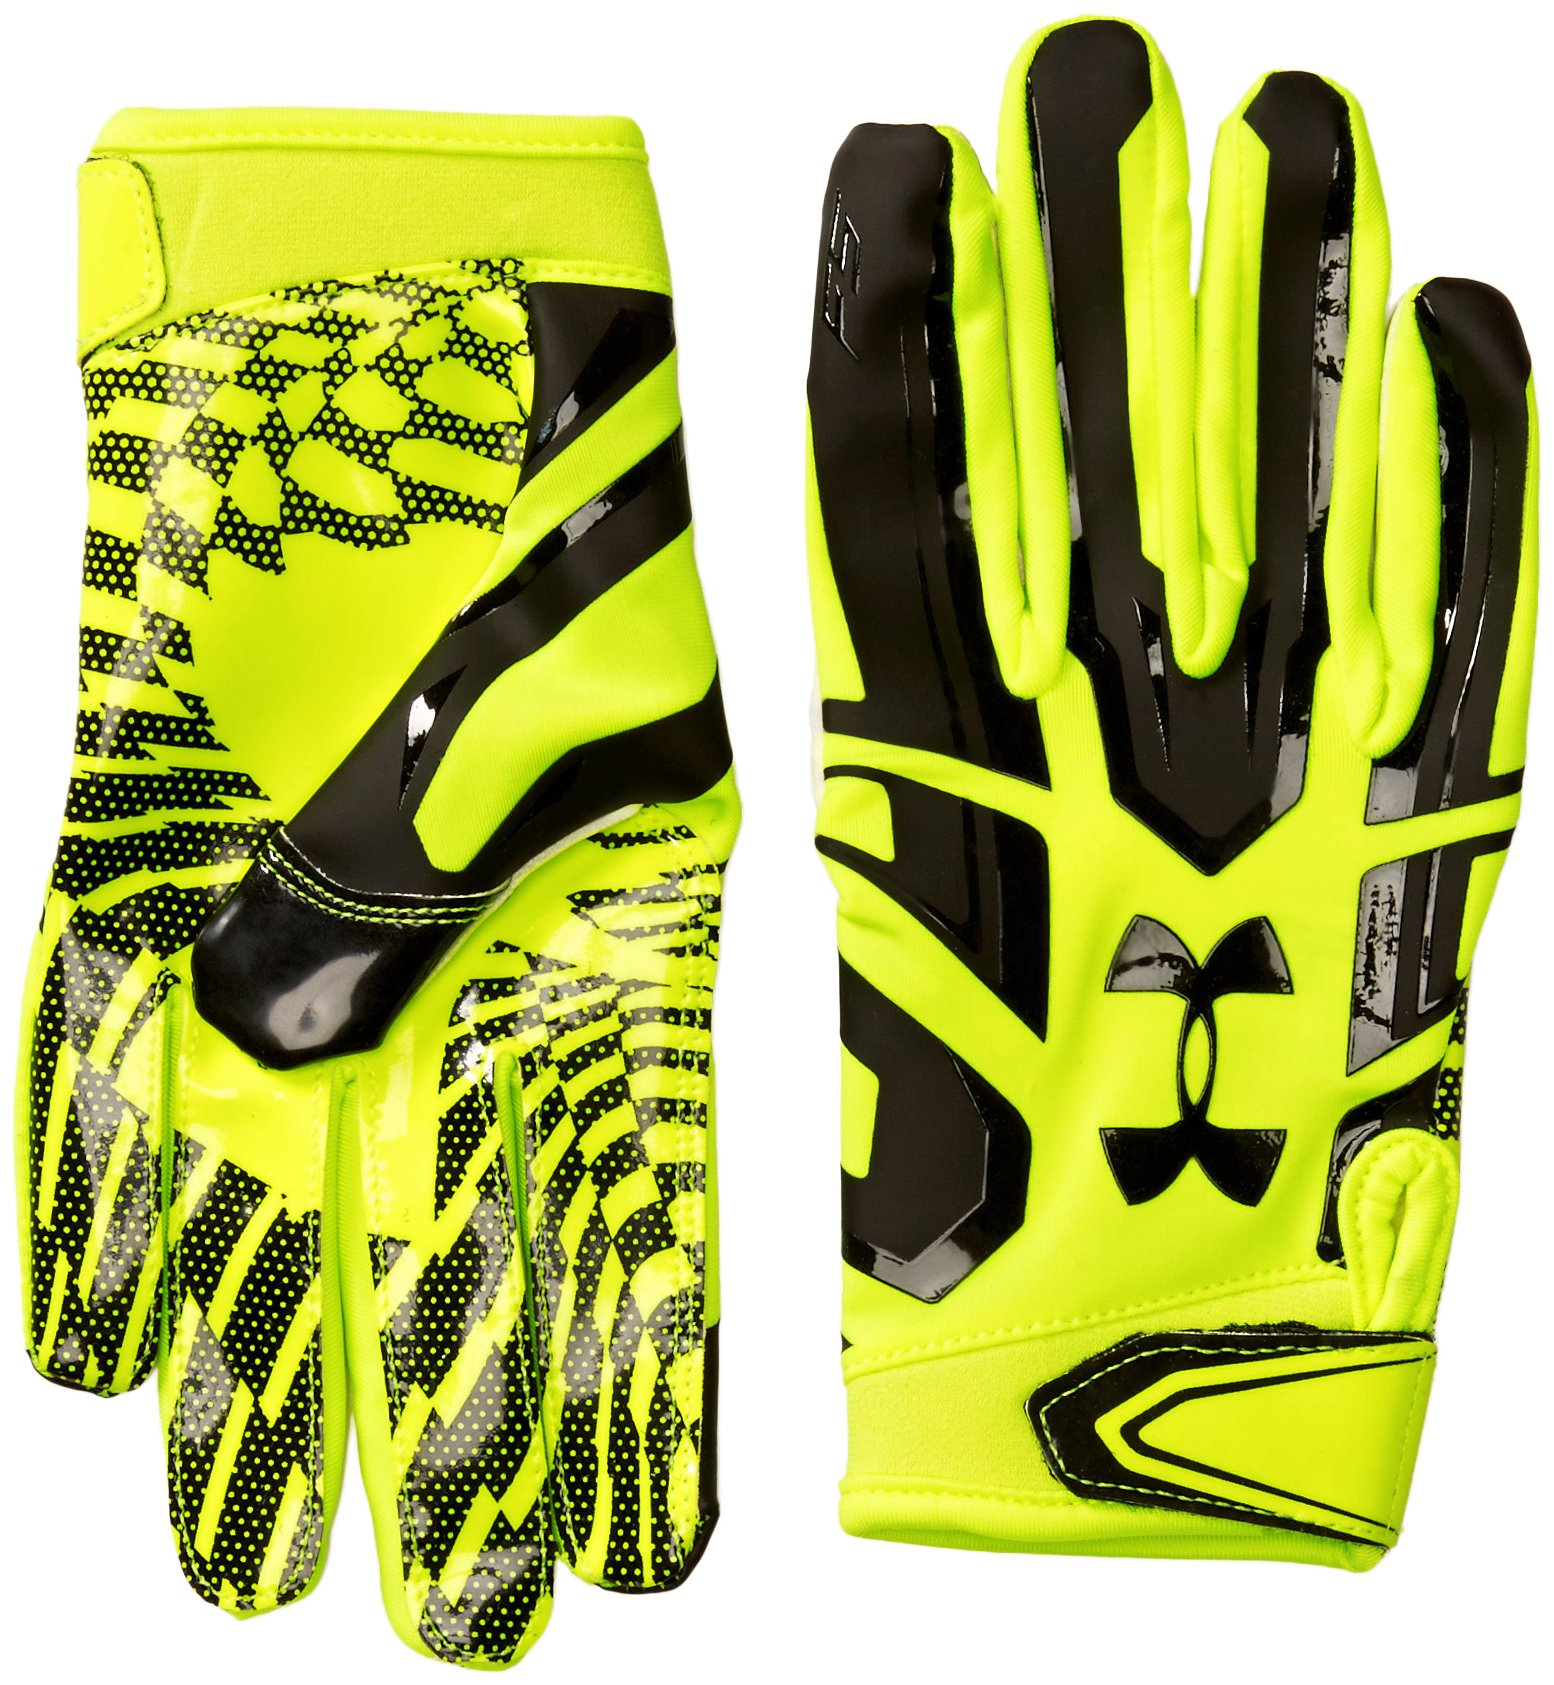 F5 Under Armour Football Gloves